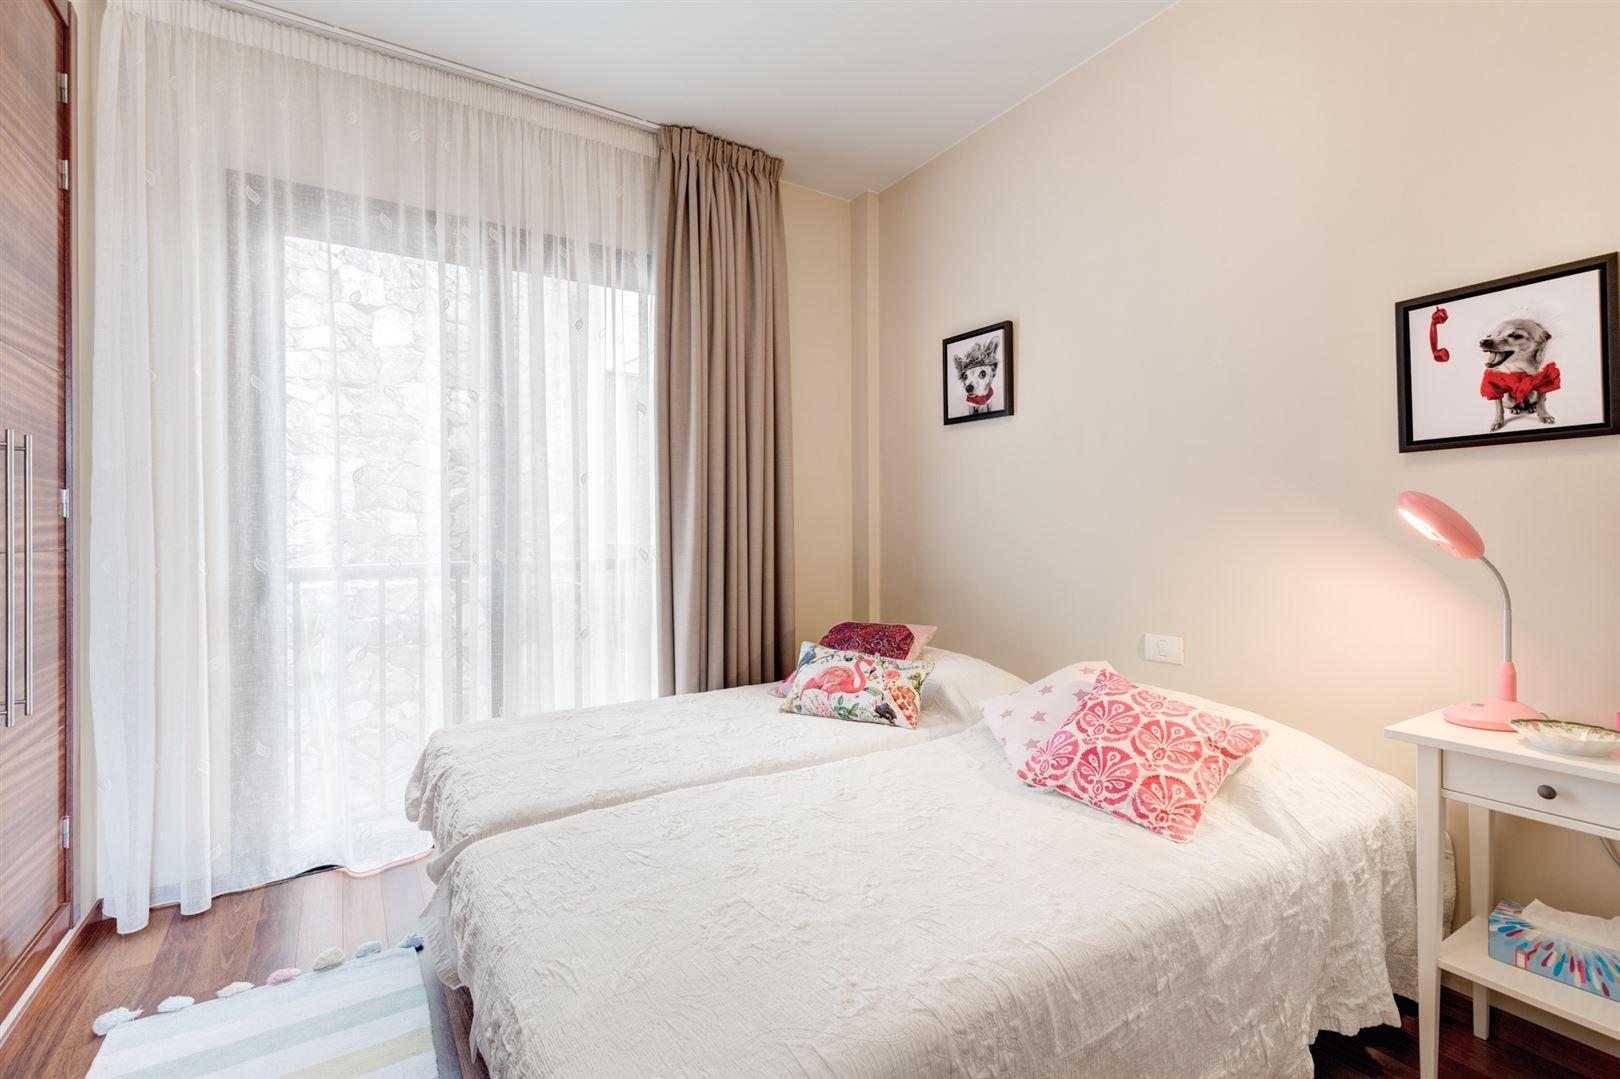 Foto 5 : Appartement te  TENERIFE (Spanje) - Prijs € 645.000